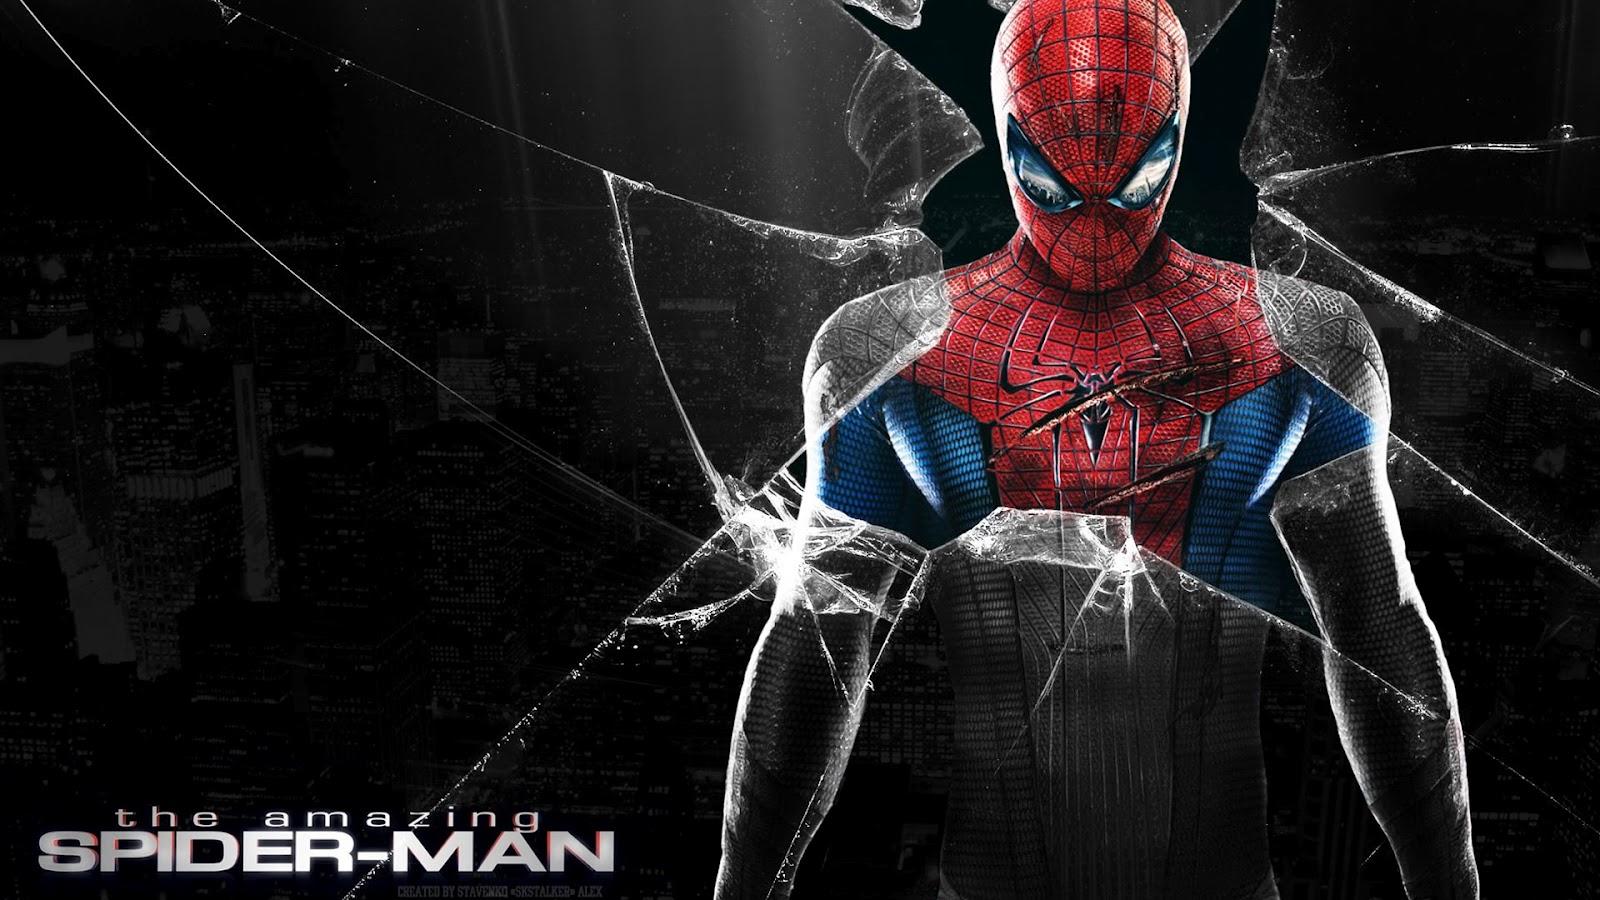 http://4.bp.blogspot.com/-JNy0K4RpGWg/UGM56LJvMbI/AAAAAAAAArg/wGkpqqyLq9s/s1600/2012-The-Amazing-Spider-Man_1920x10805.jpg